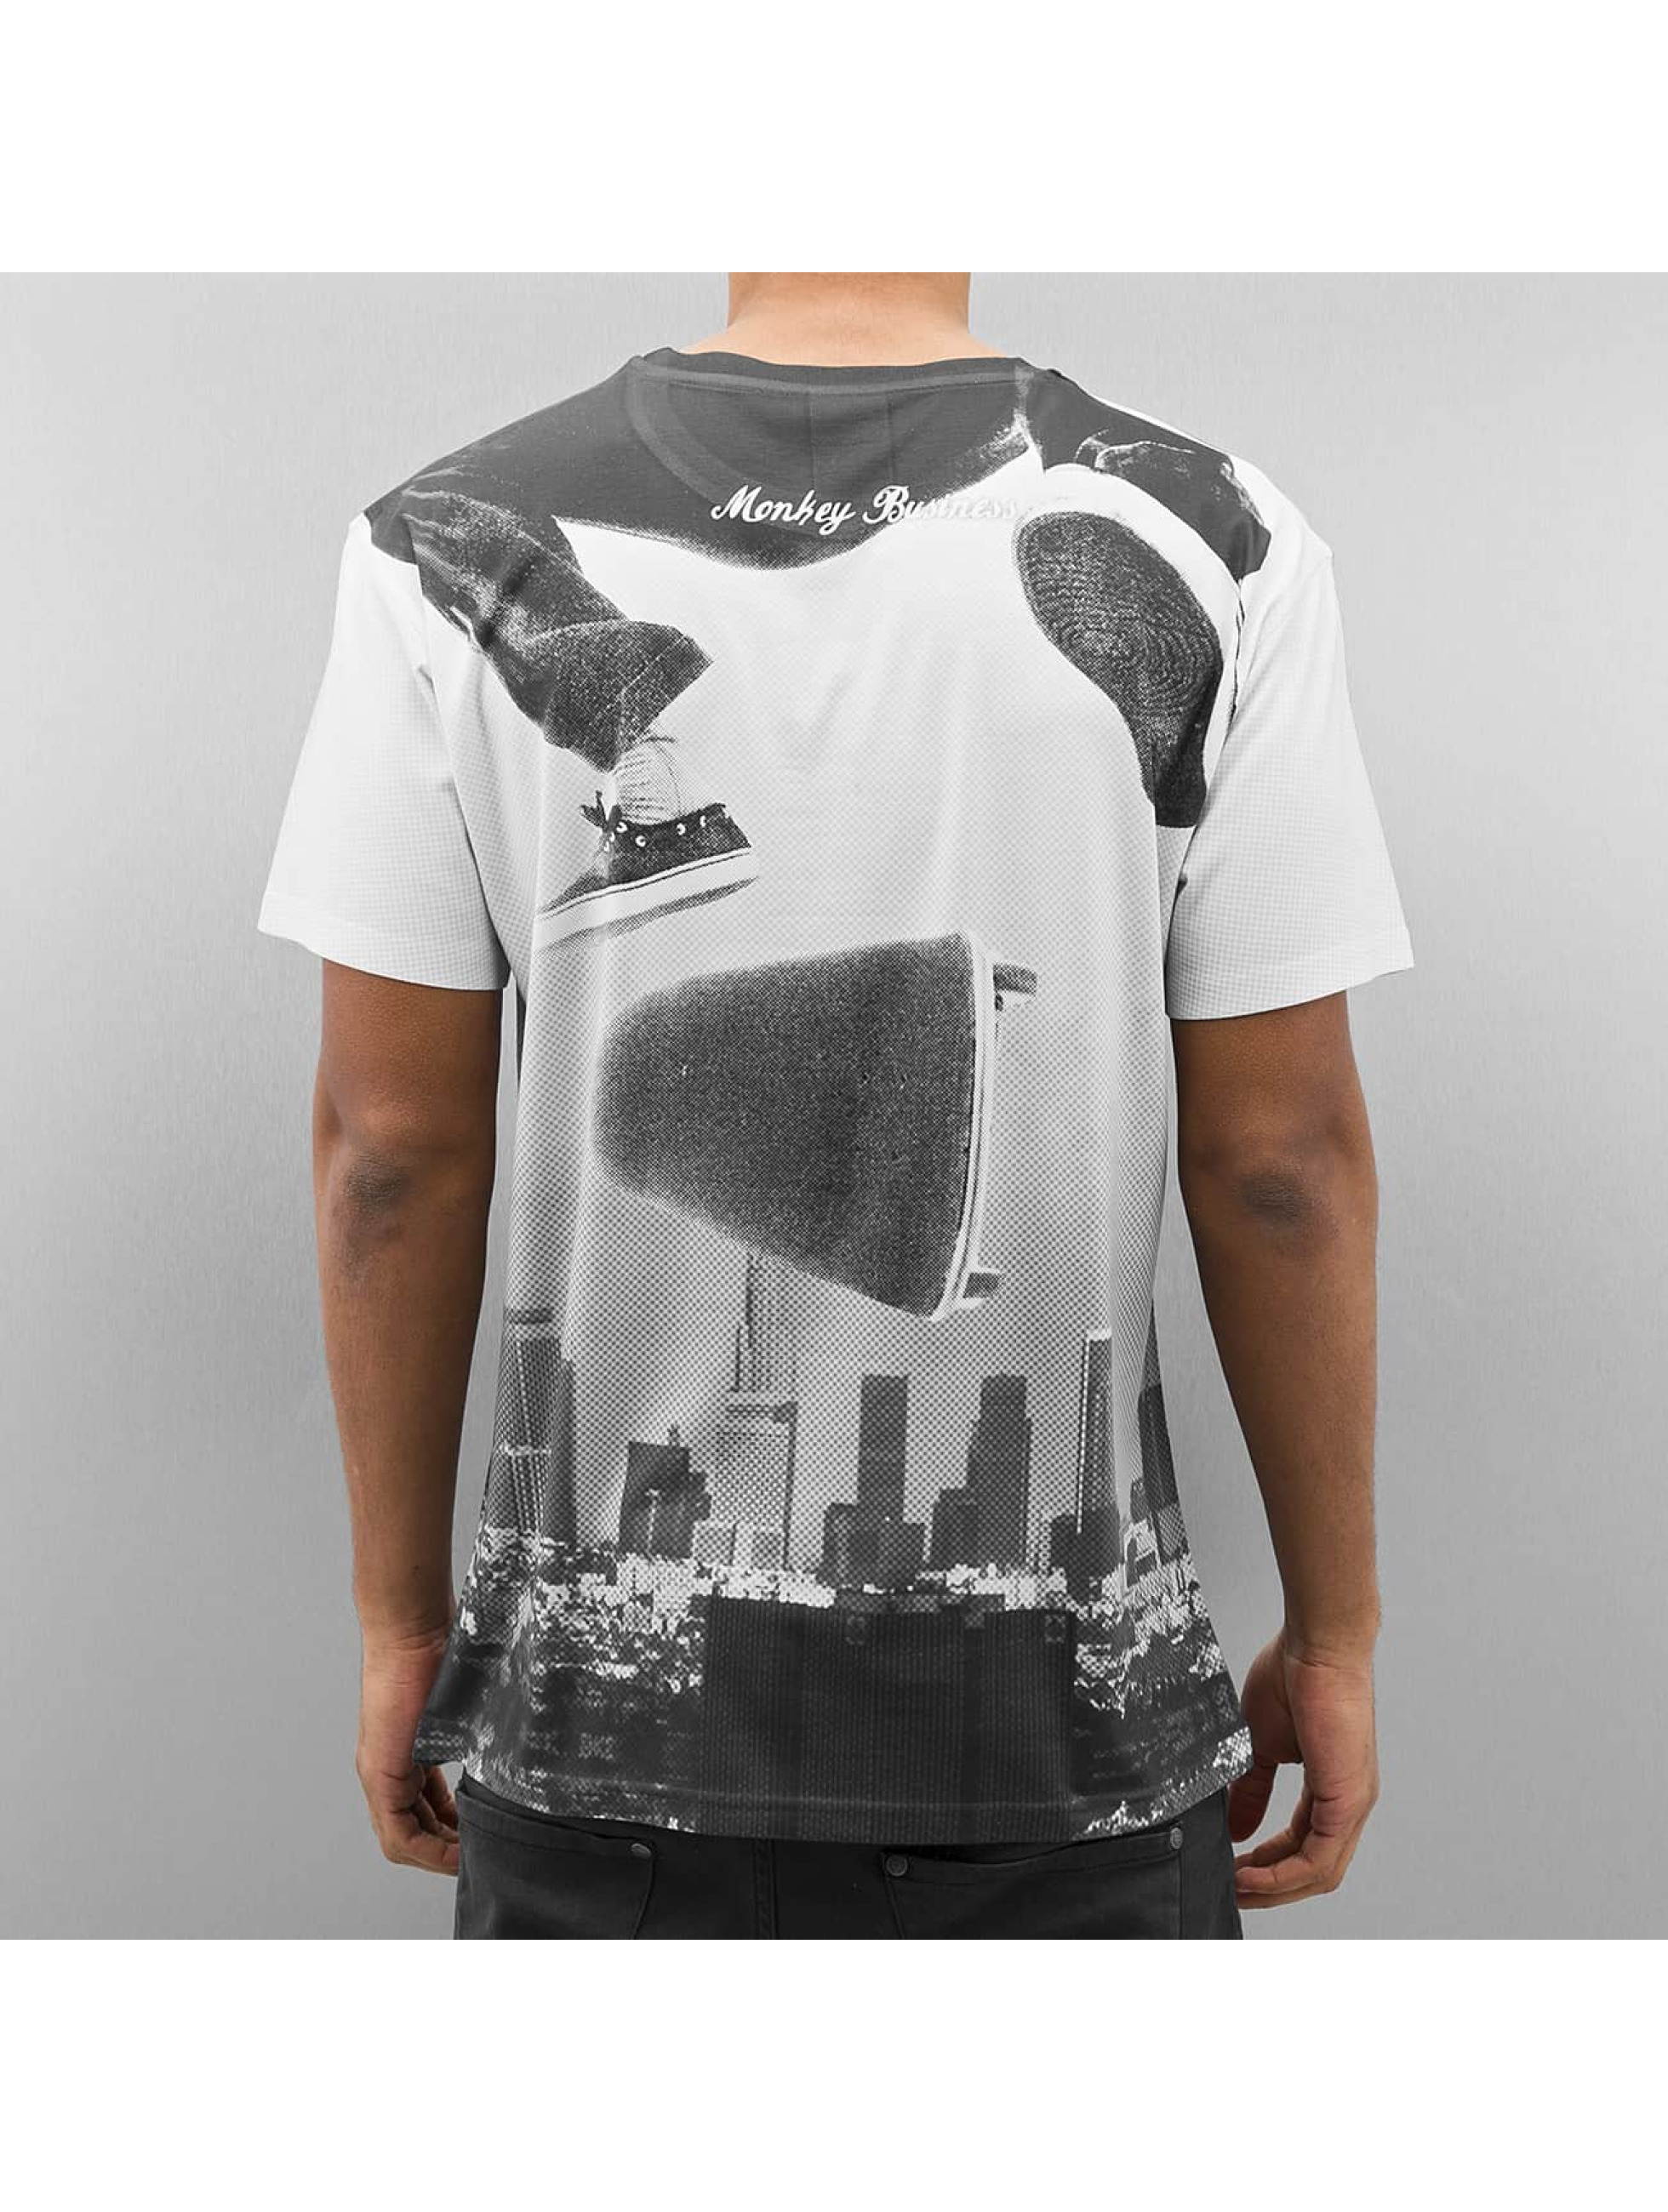 Monkey Business T-Shirt La Skate grau